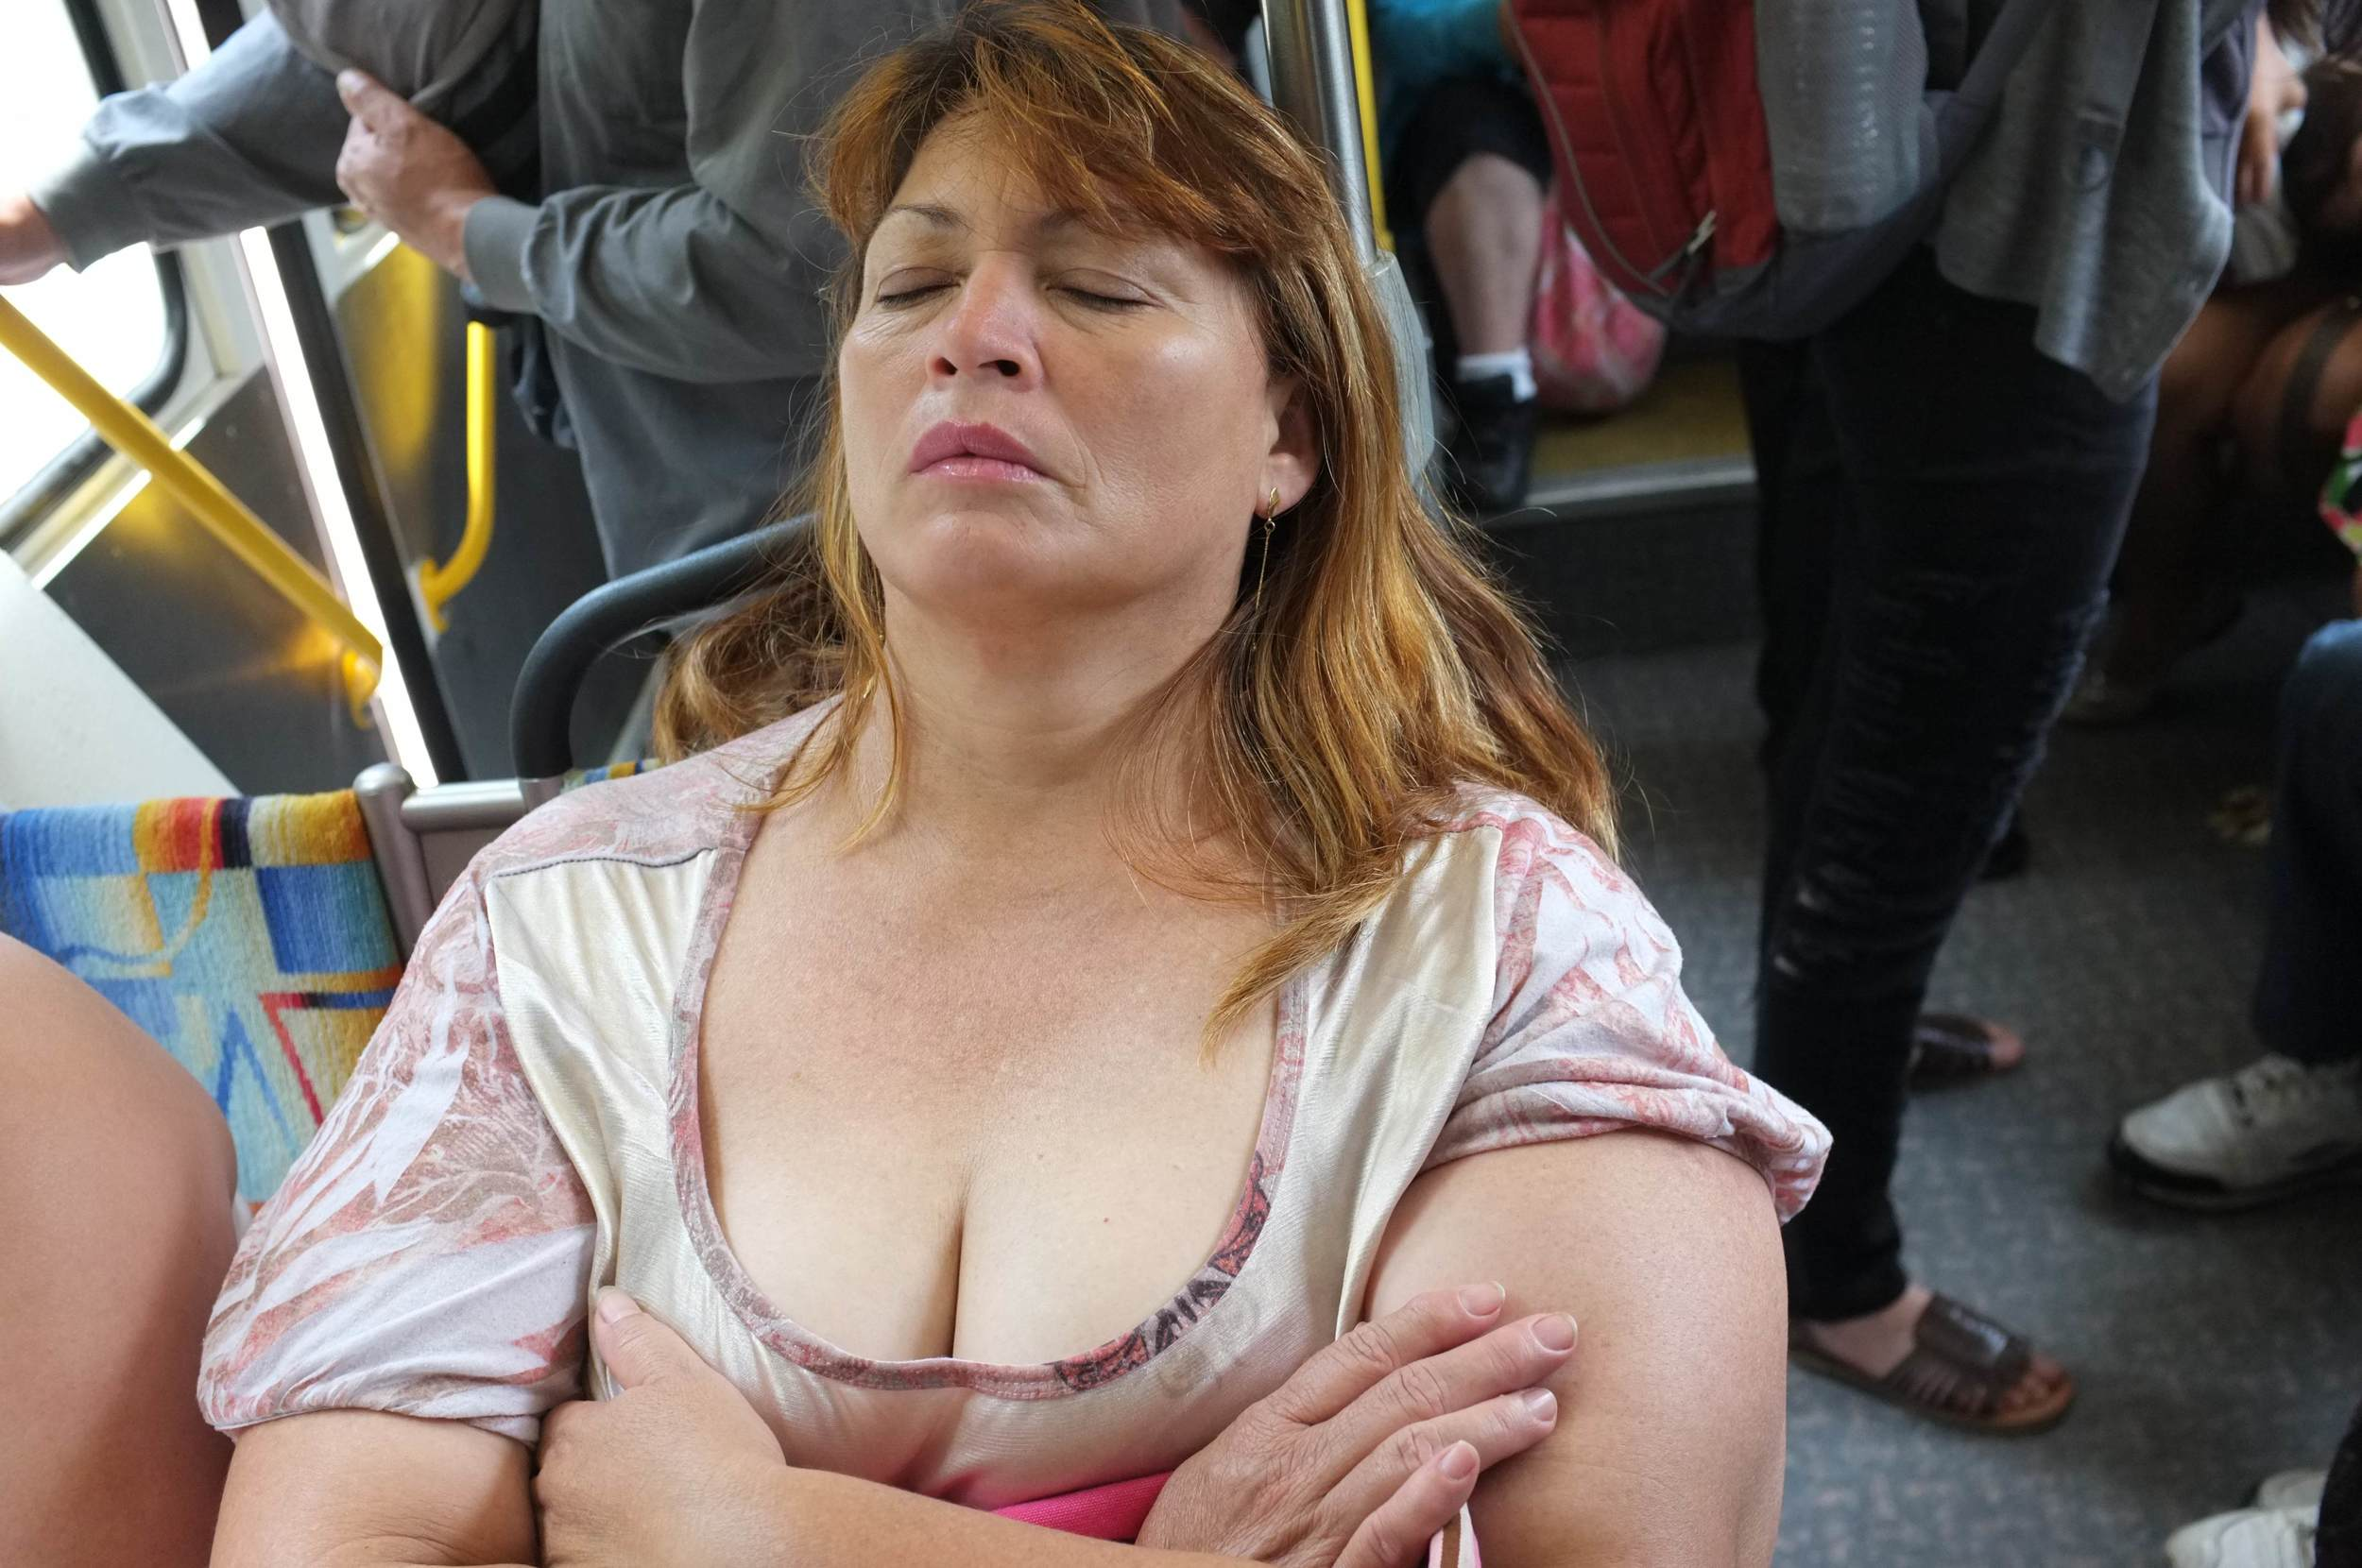 woman_asleep.jpg